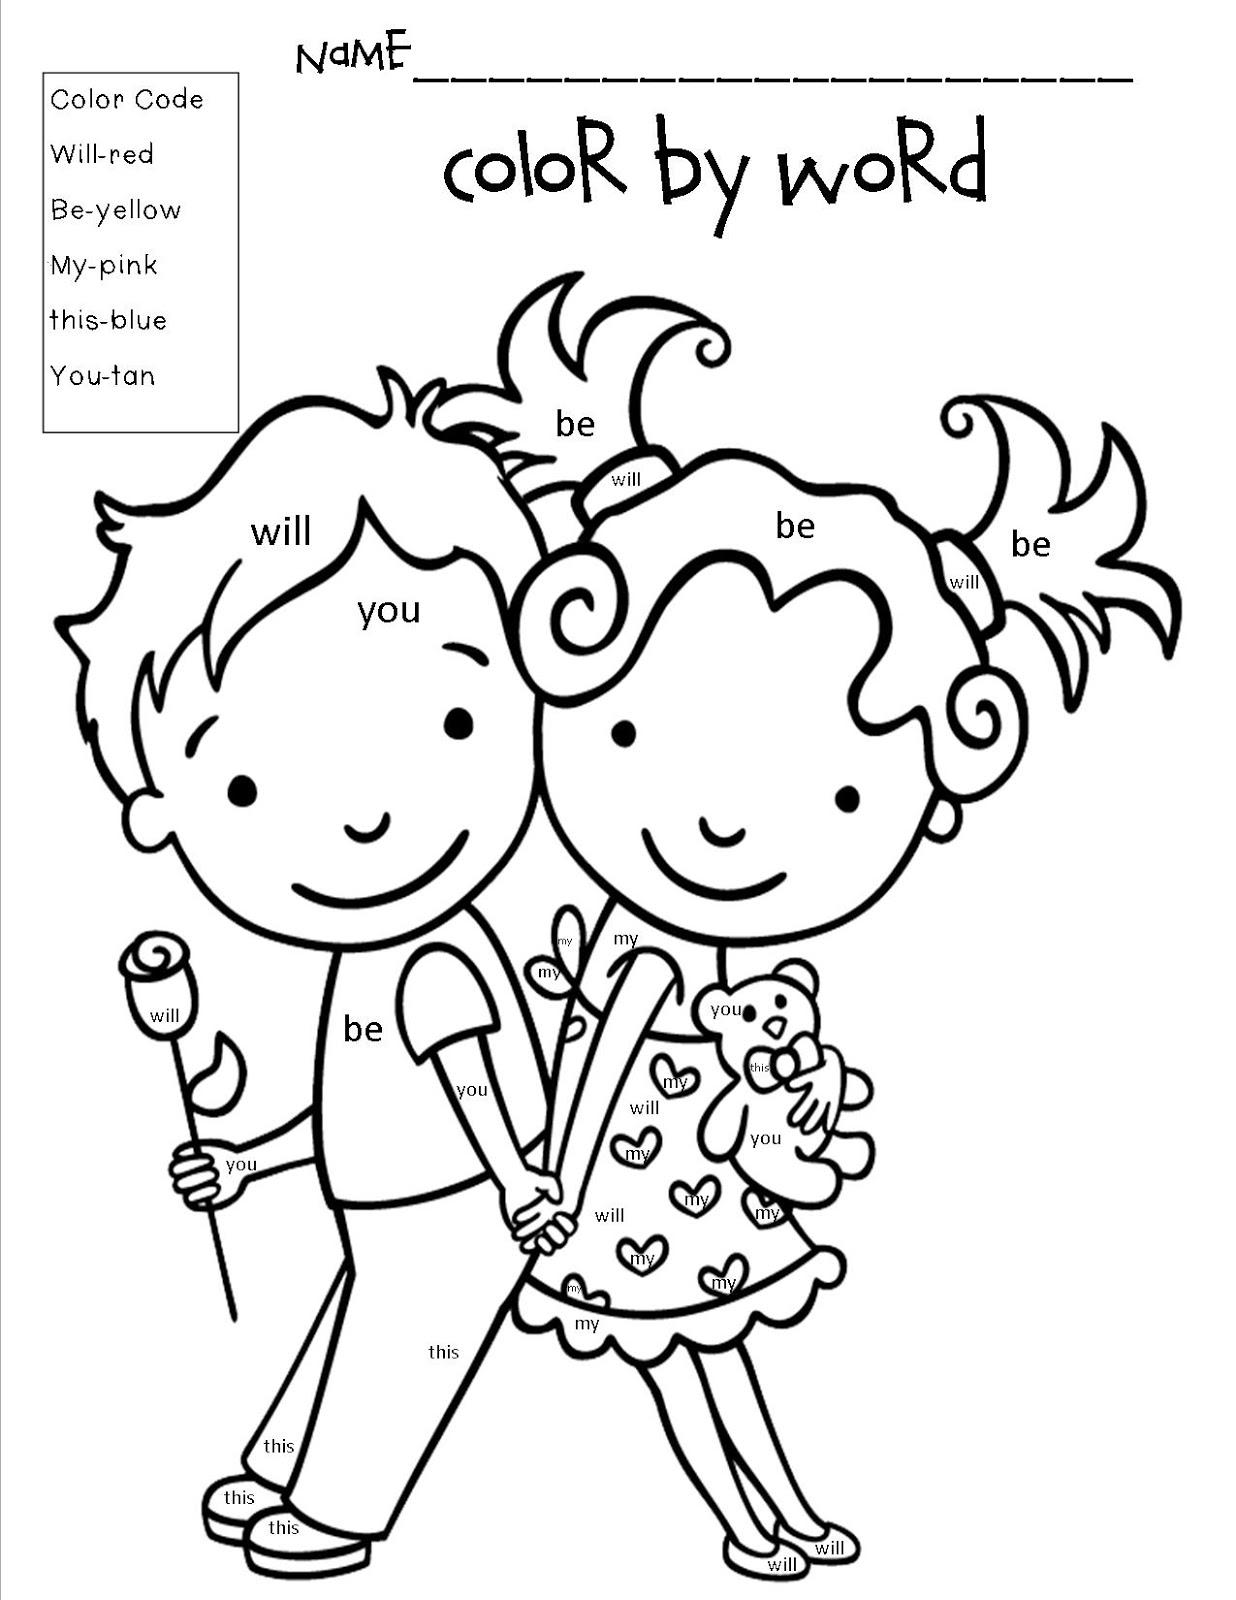 valentine\'s day coloring pages for kindergarten | Mrs. Bohaty's Kindergarten Kingdom: February 2013